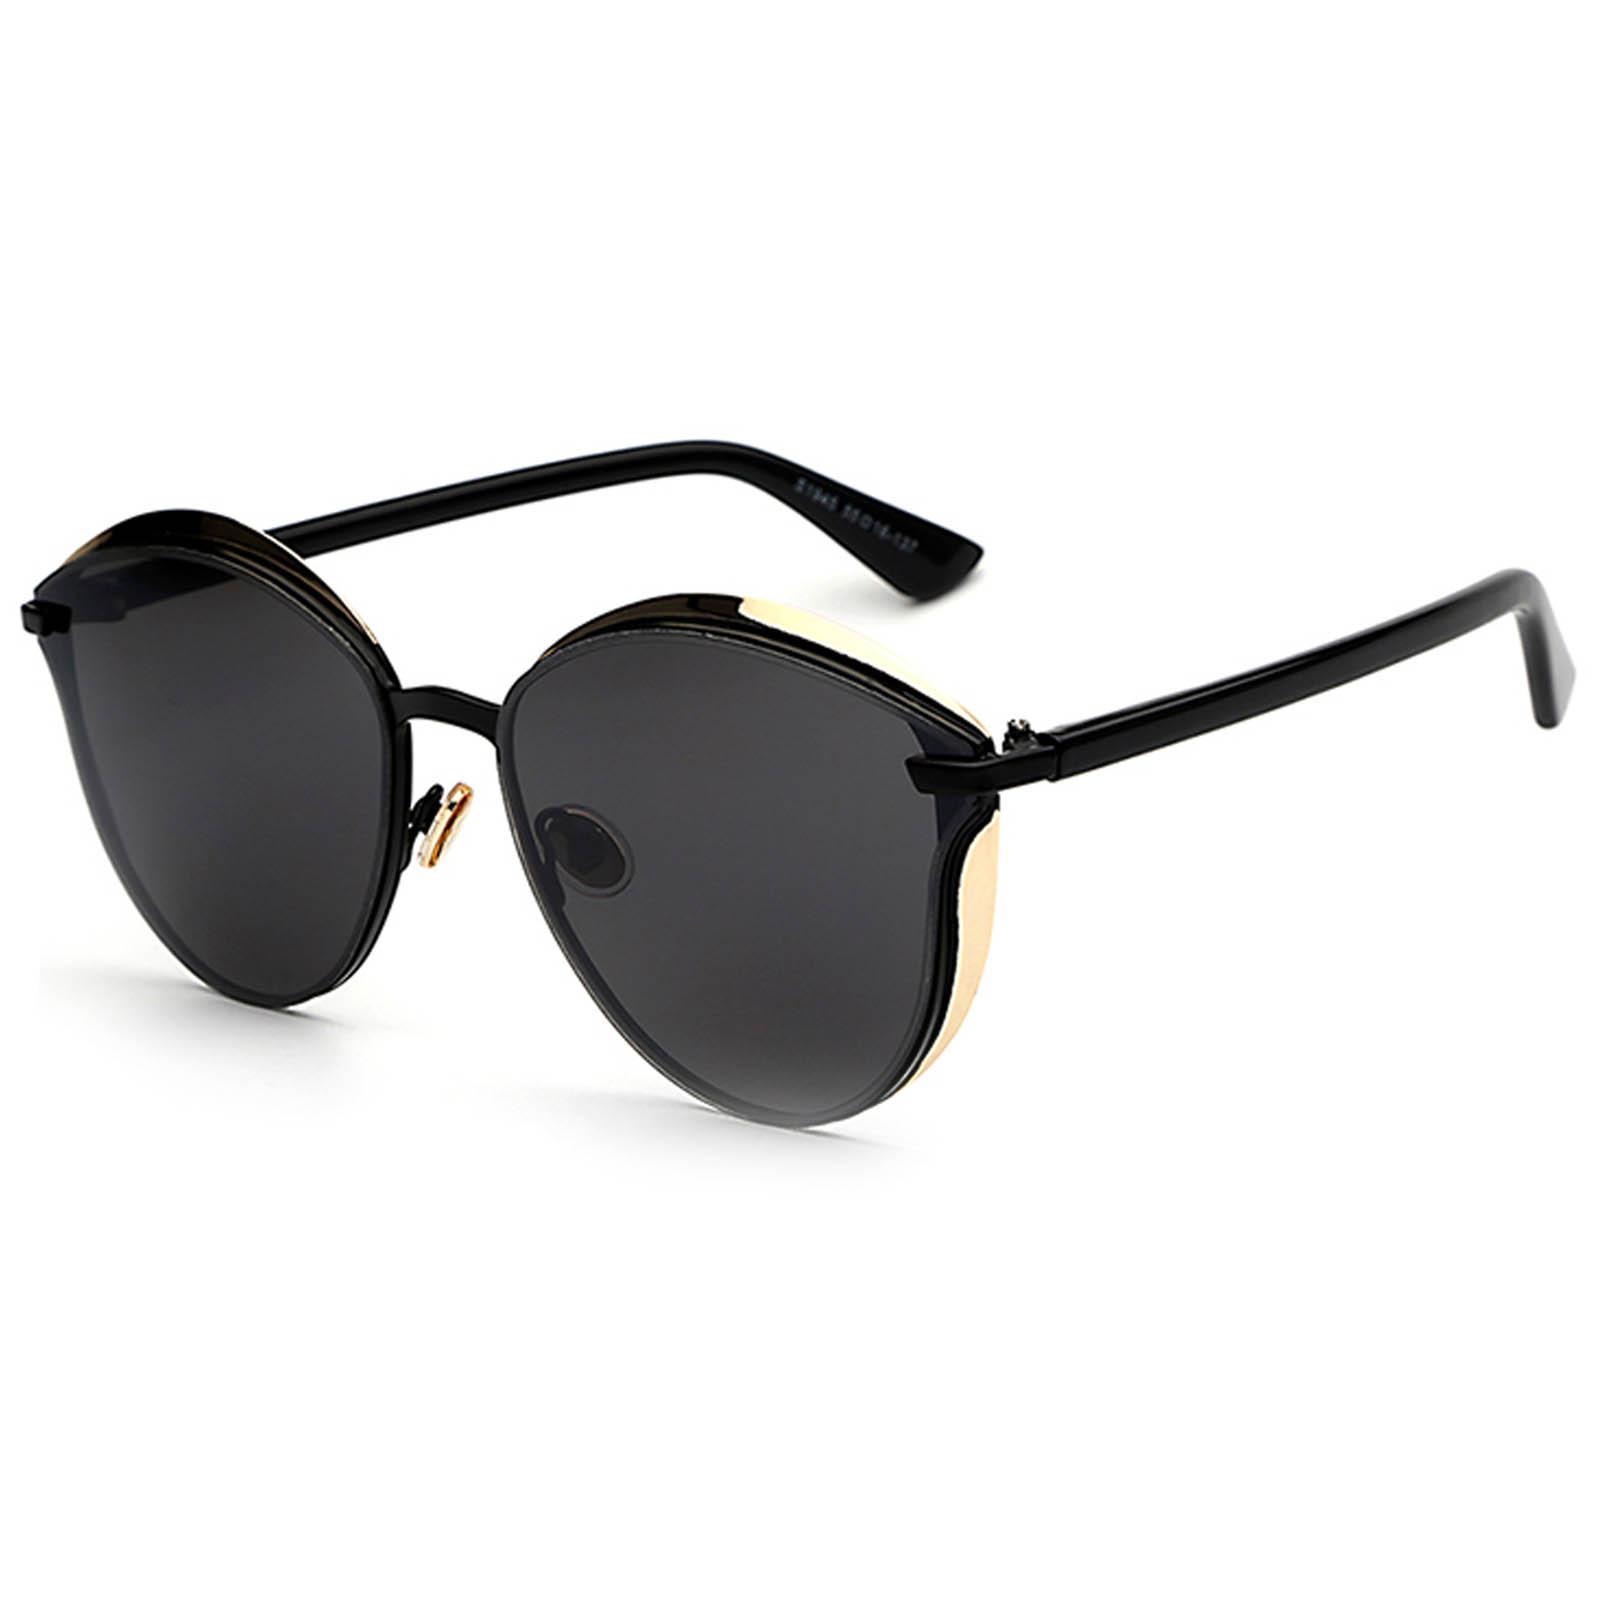 OWL ® 017 C1 Cat Round Eyewear Sunglasses Women's Men's Metal Round Black Frame Black Lens One Pair